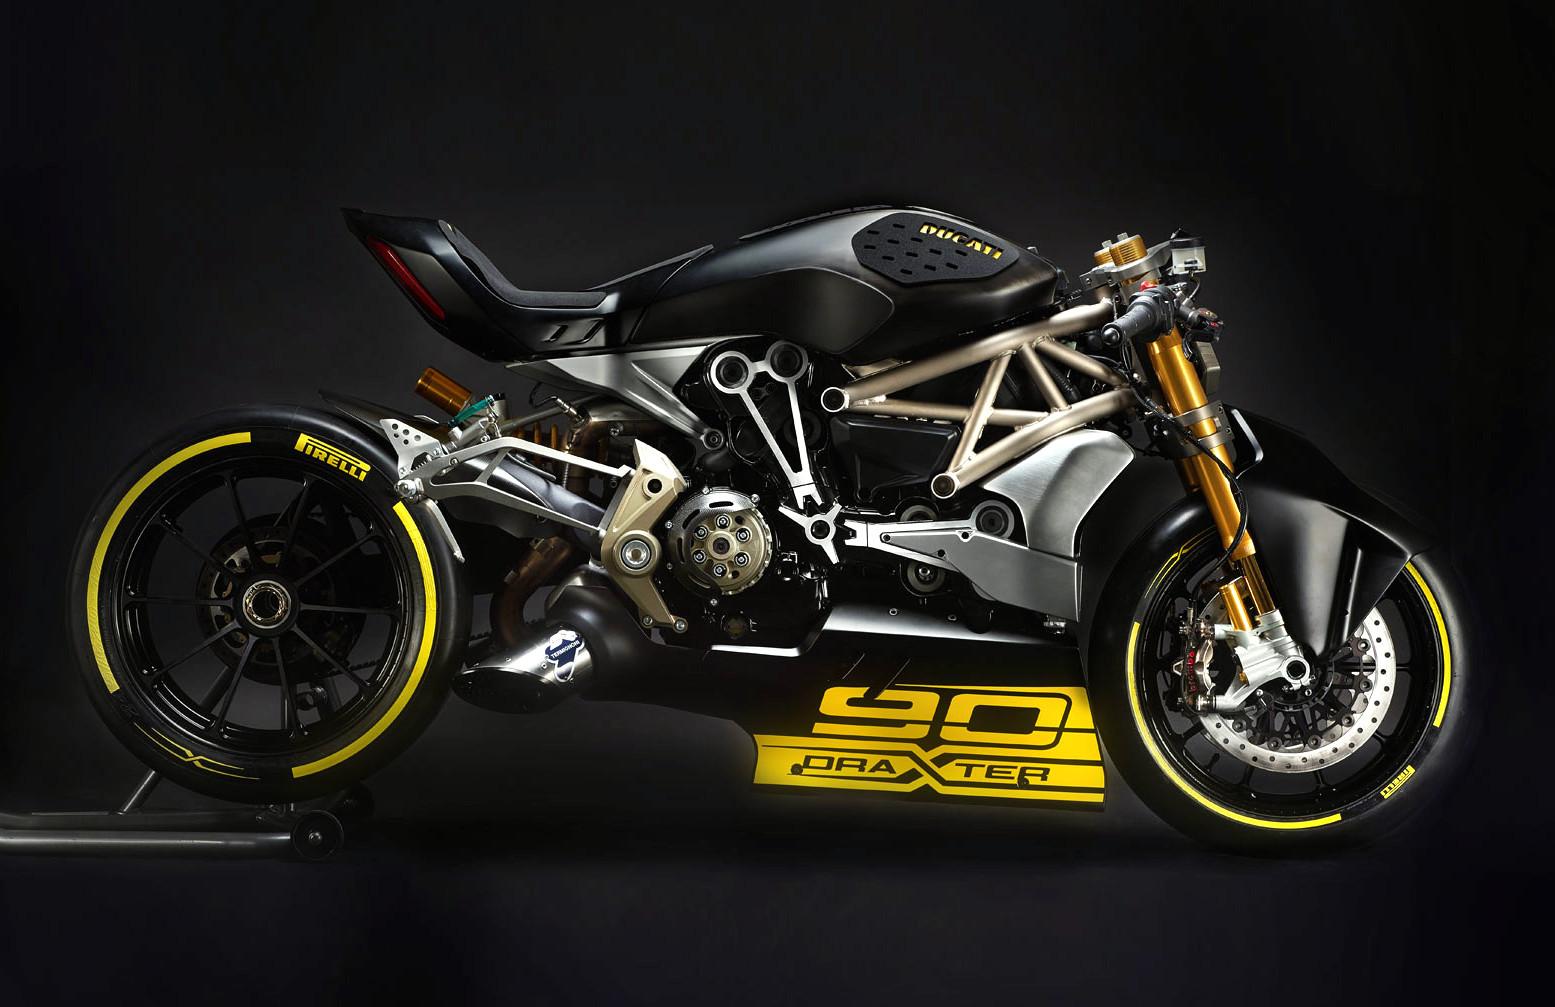 Ducati DraXter - Linstantauto.com3